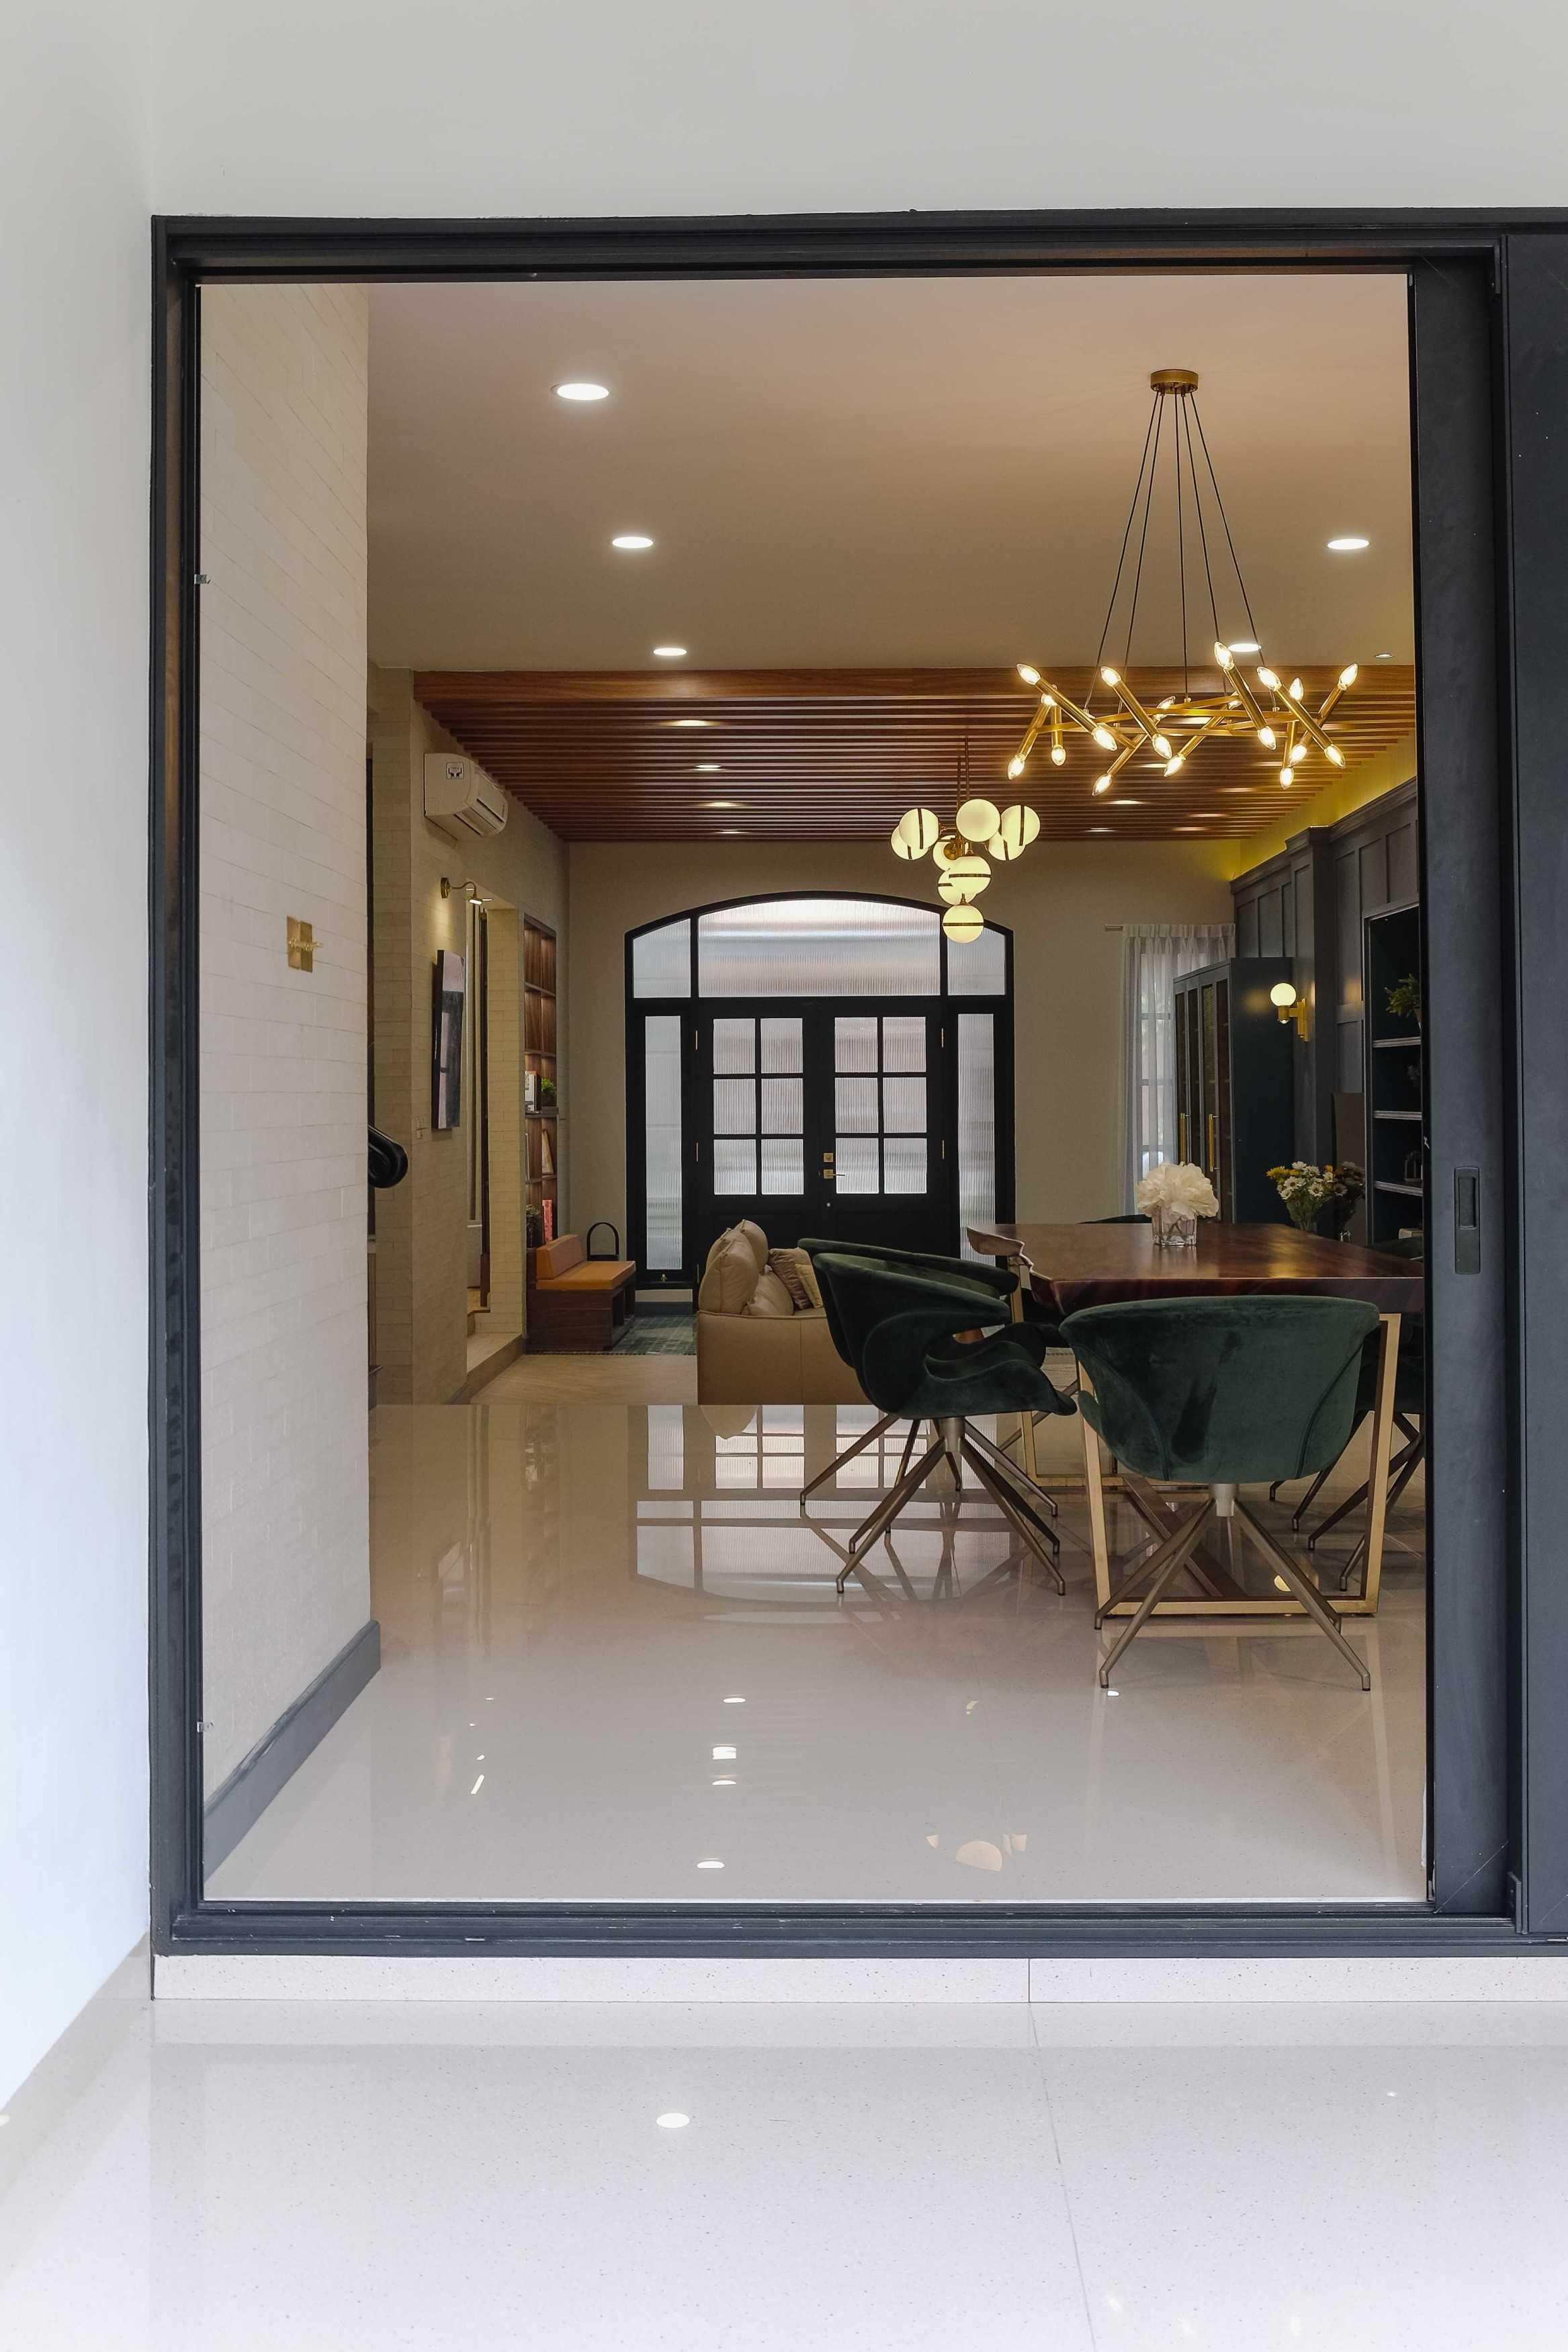 Studio Alo House H Medan, Kota Medan, Sumatera Utara, Indonesia Medan, Kota Medan, Sumatera Utara, Indonesia Ranch Style Residential   115673